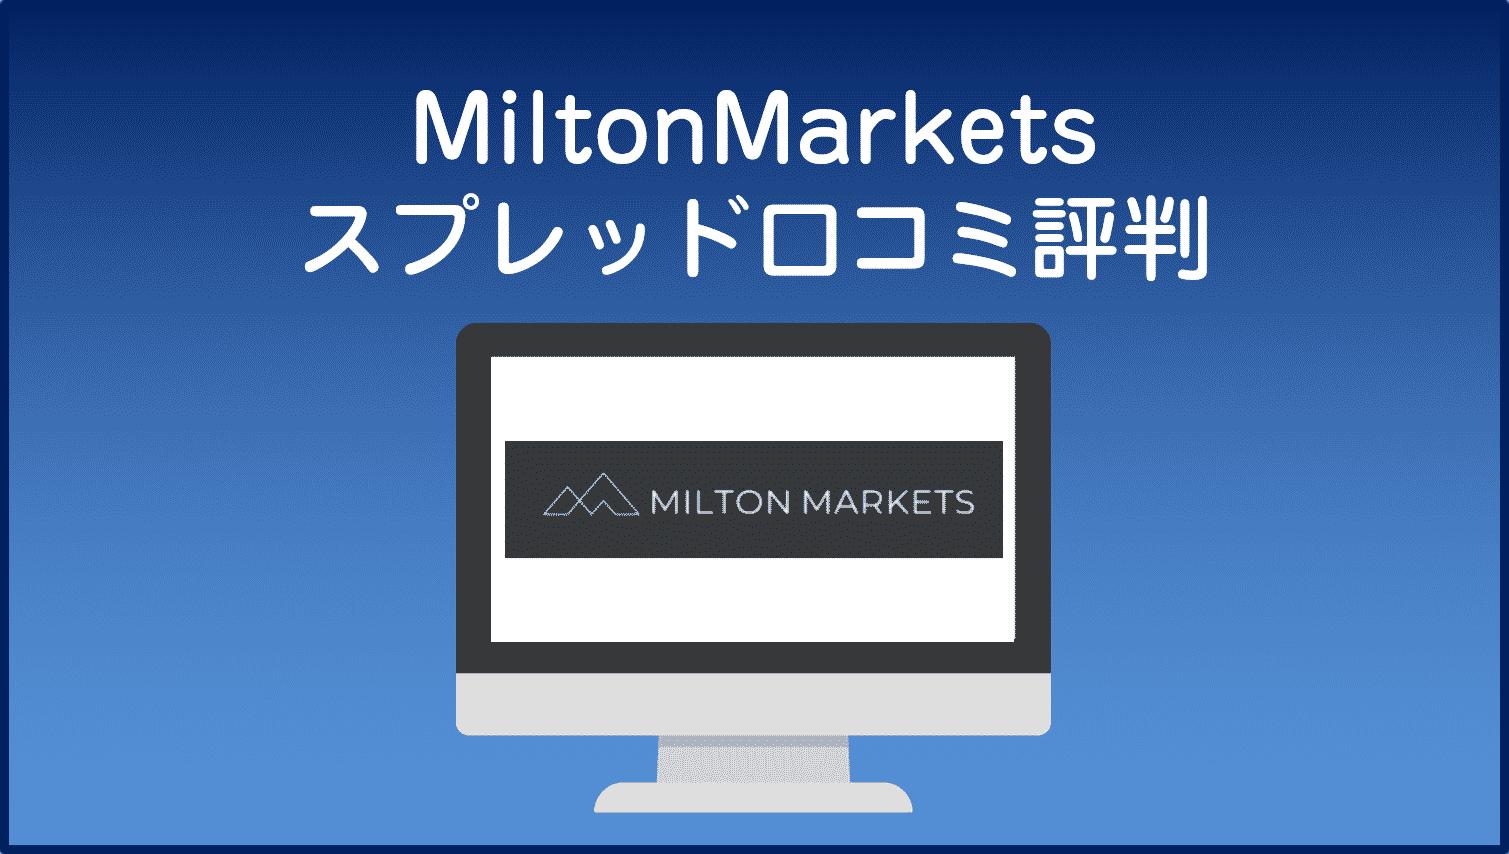 MiltonMarketsスプレッド口コミ・評判